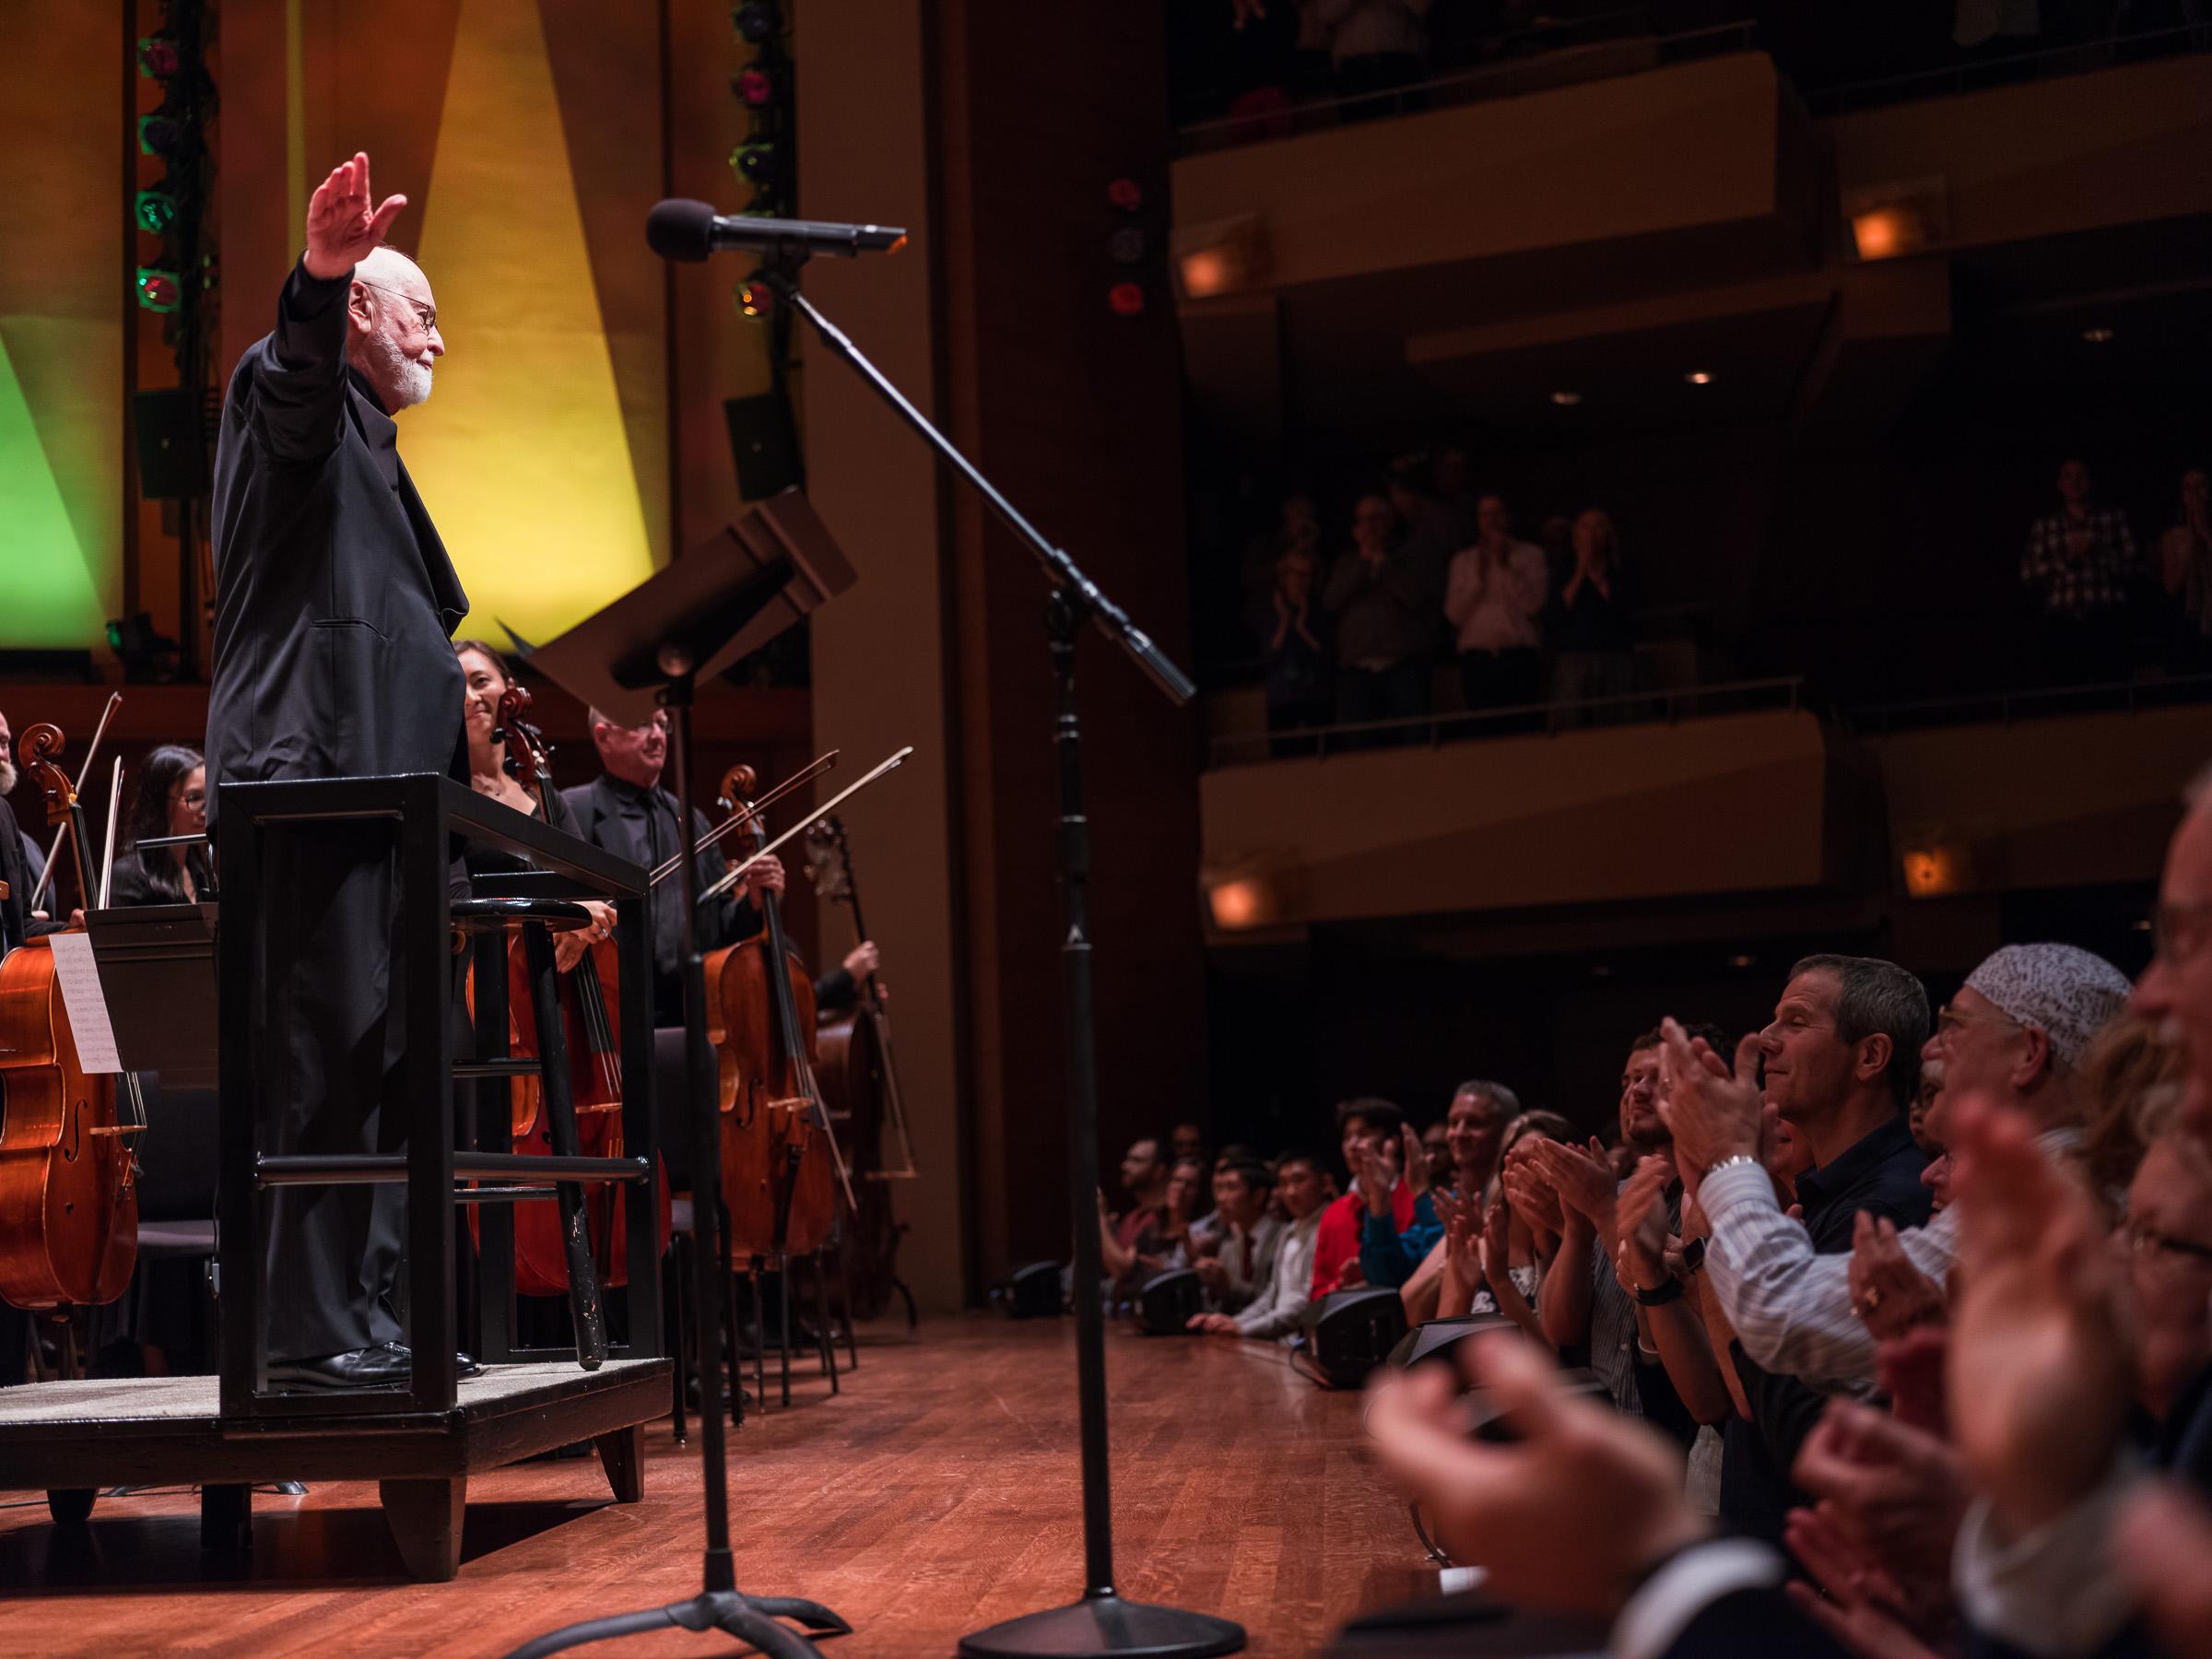 brandon_patoc_john_williams_Steven_Spielberg, Seattle_Symphony_Orchestra_Conert_0053.JPG